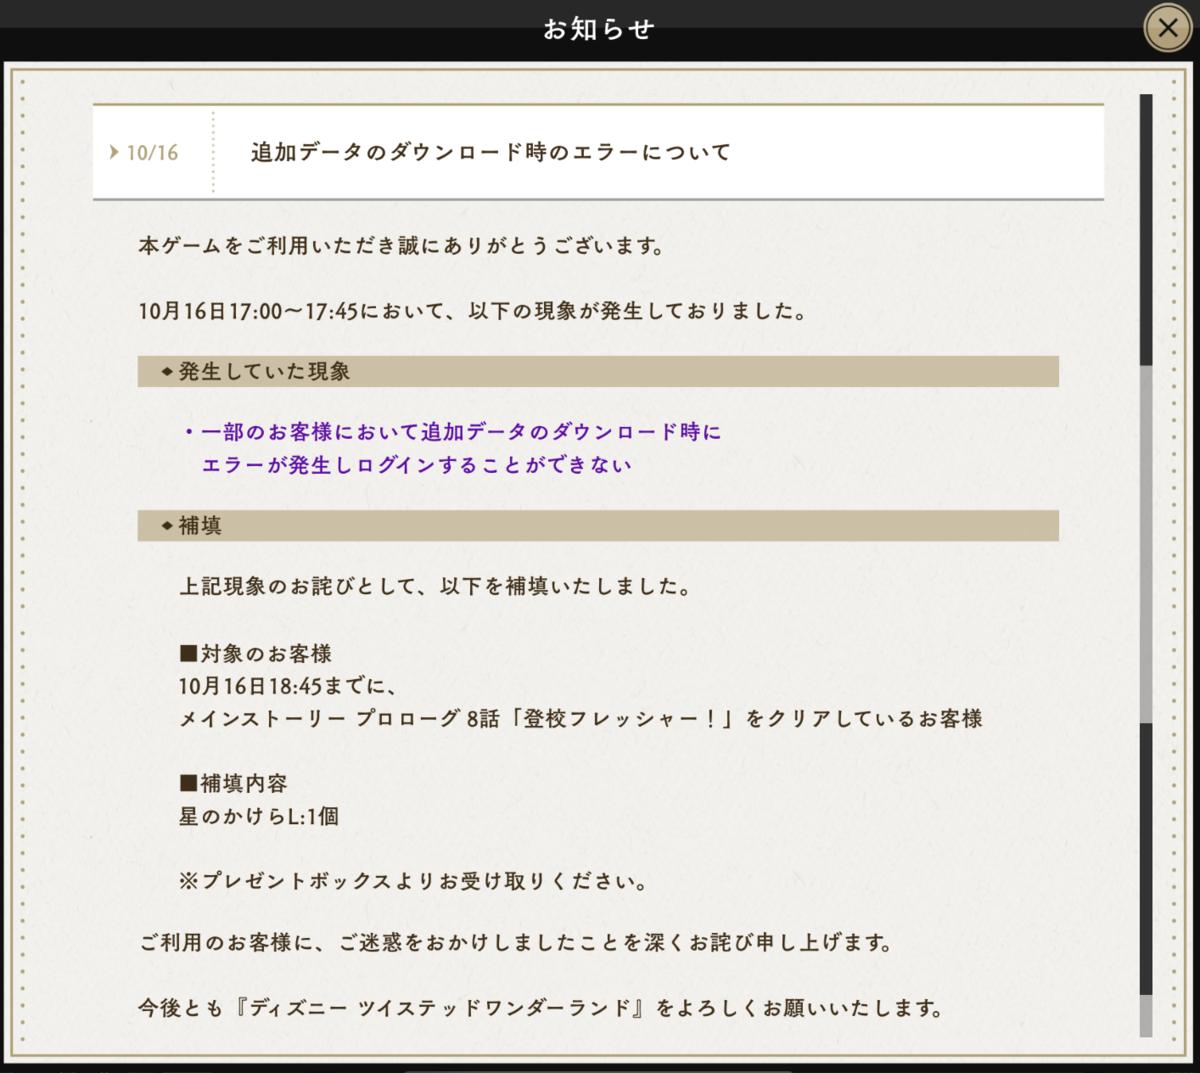 f:id:motimoti444:20201016210445p:plain